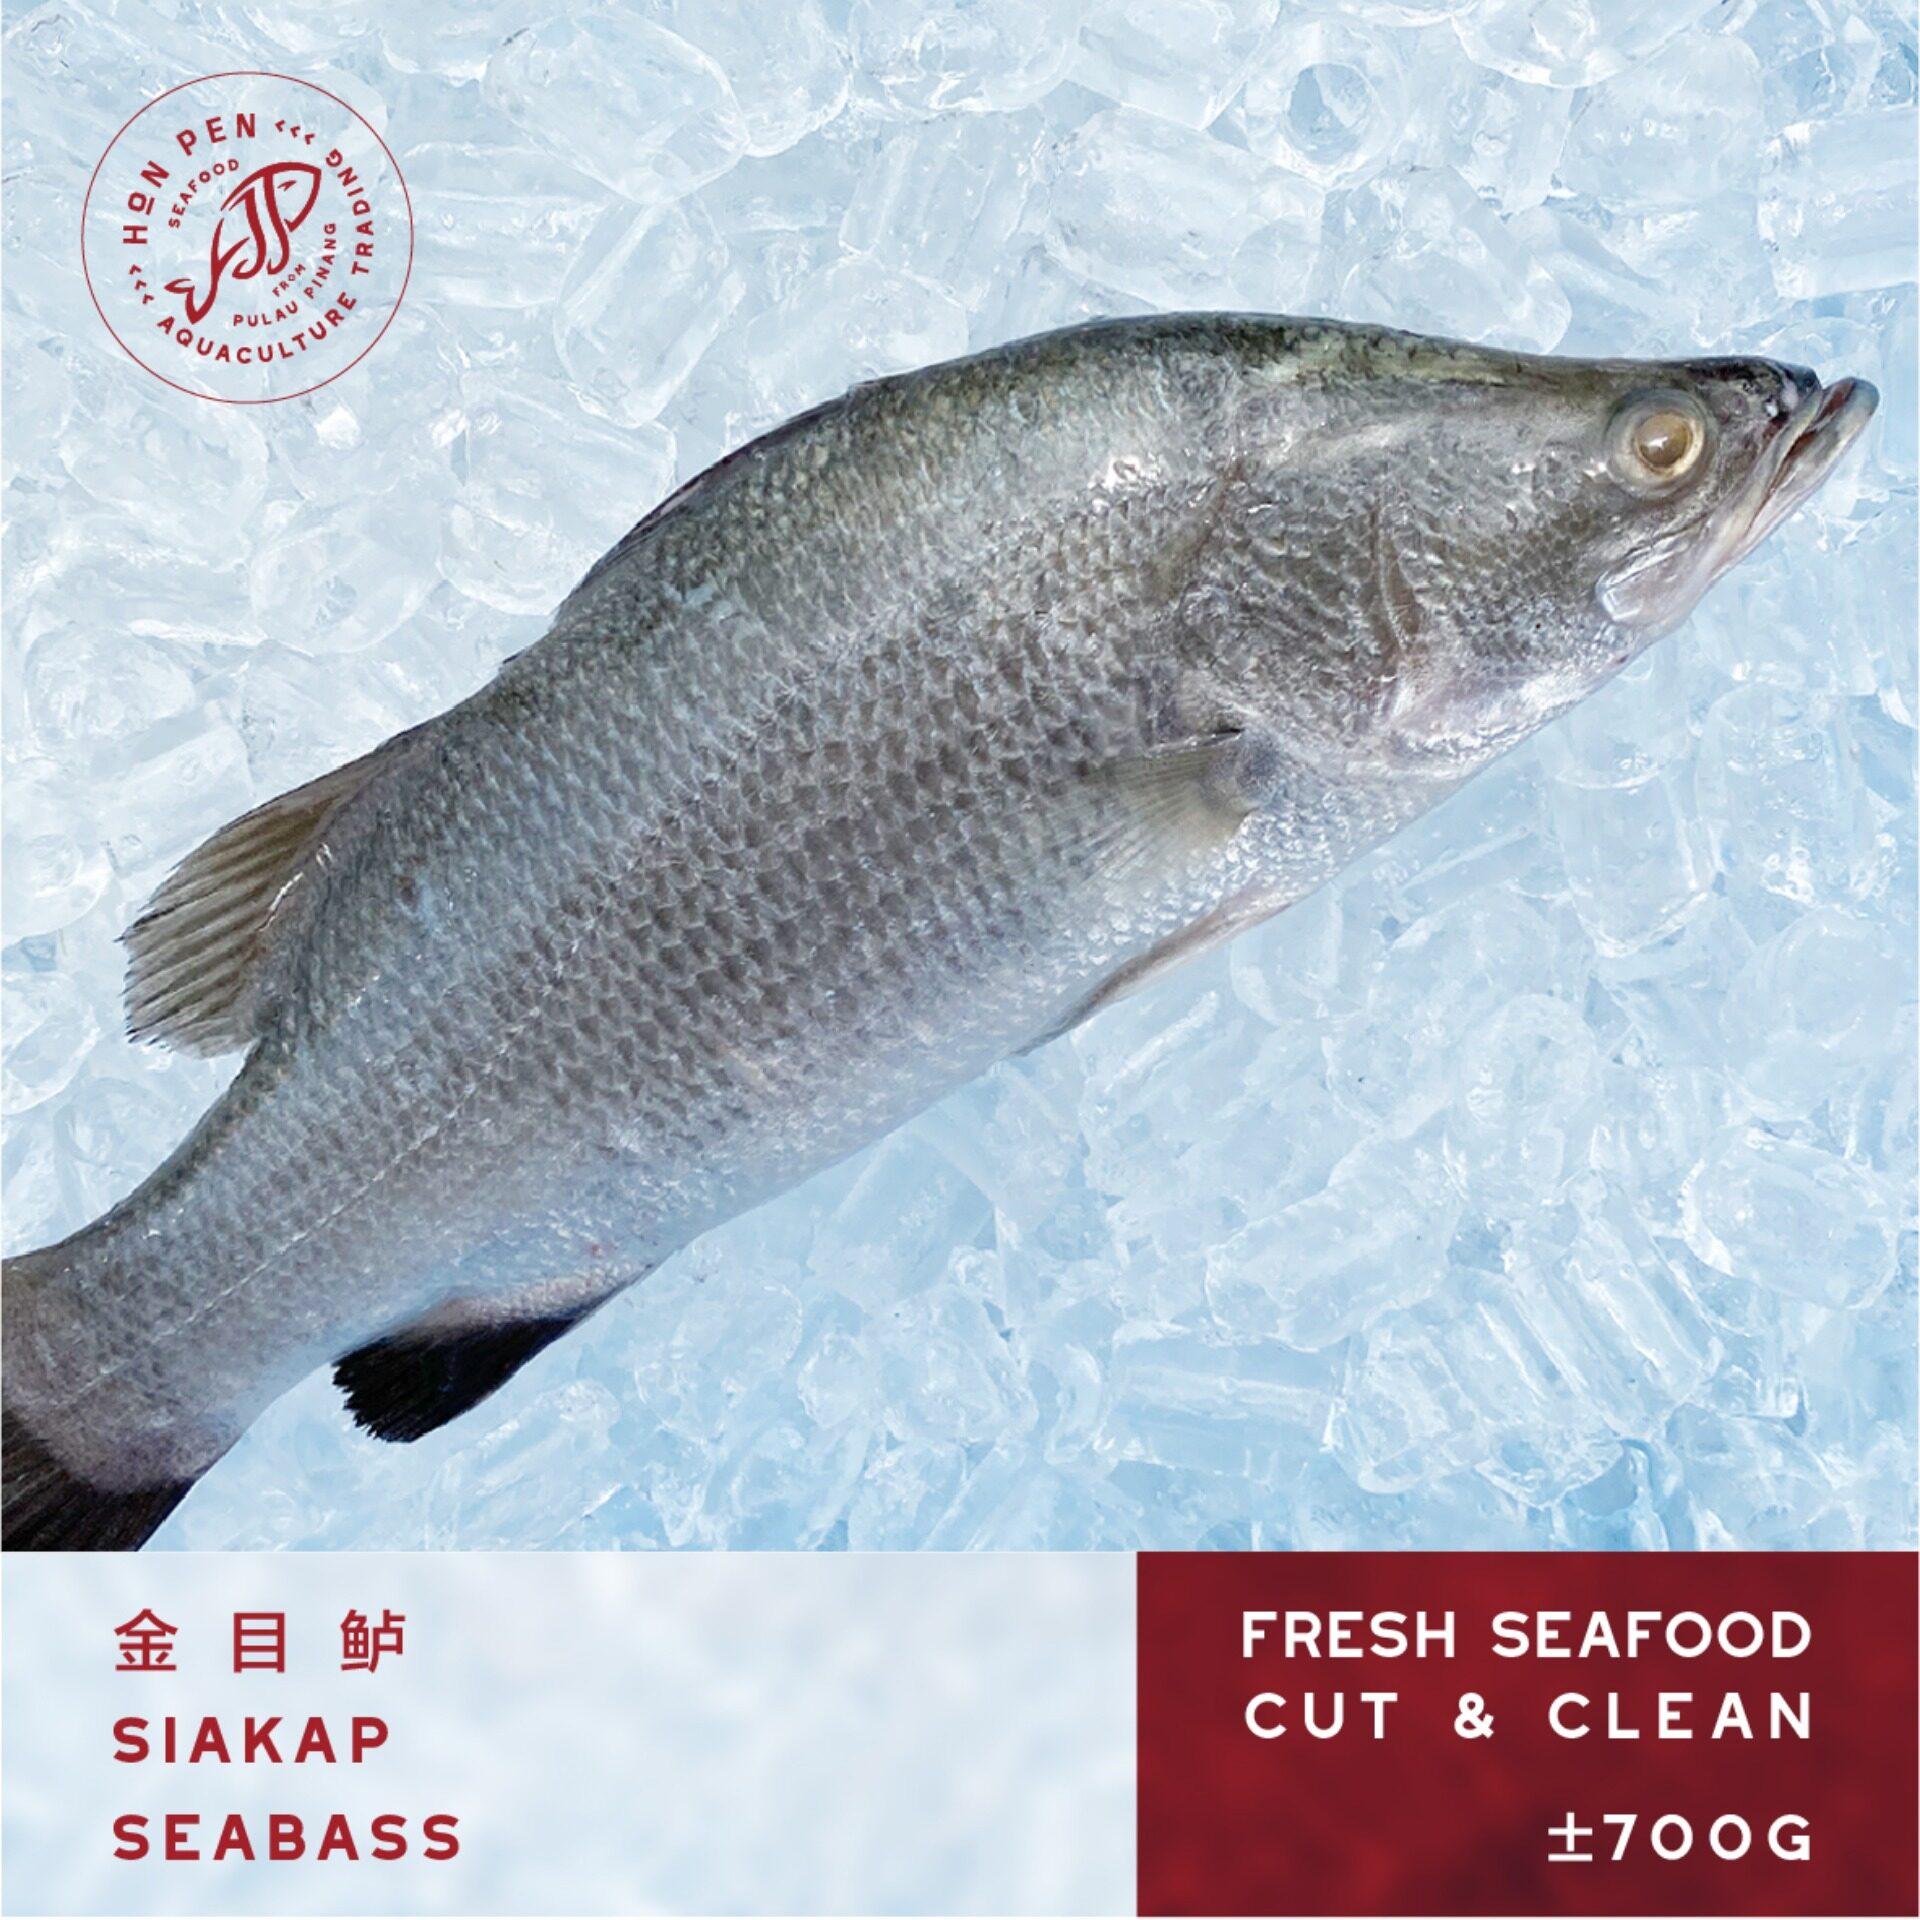 3pcs SEABASS 金目鲈 SIAKAP (Seafood) ±700g